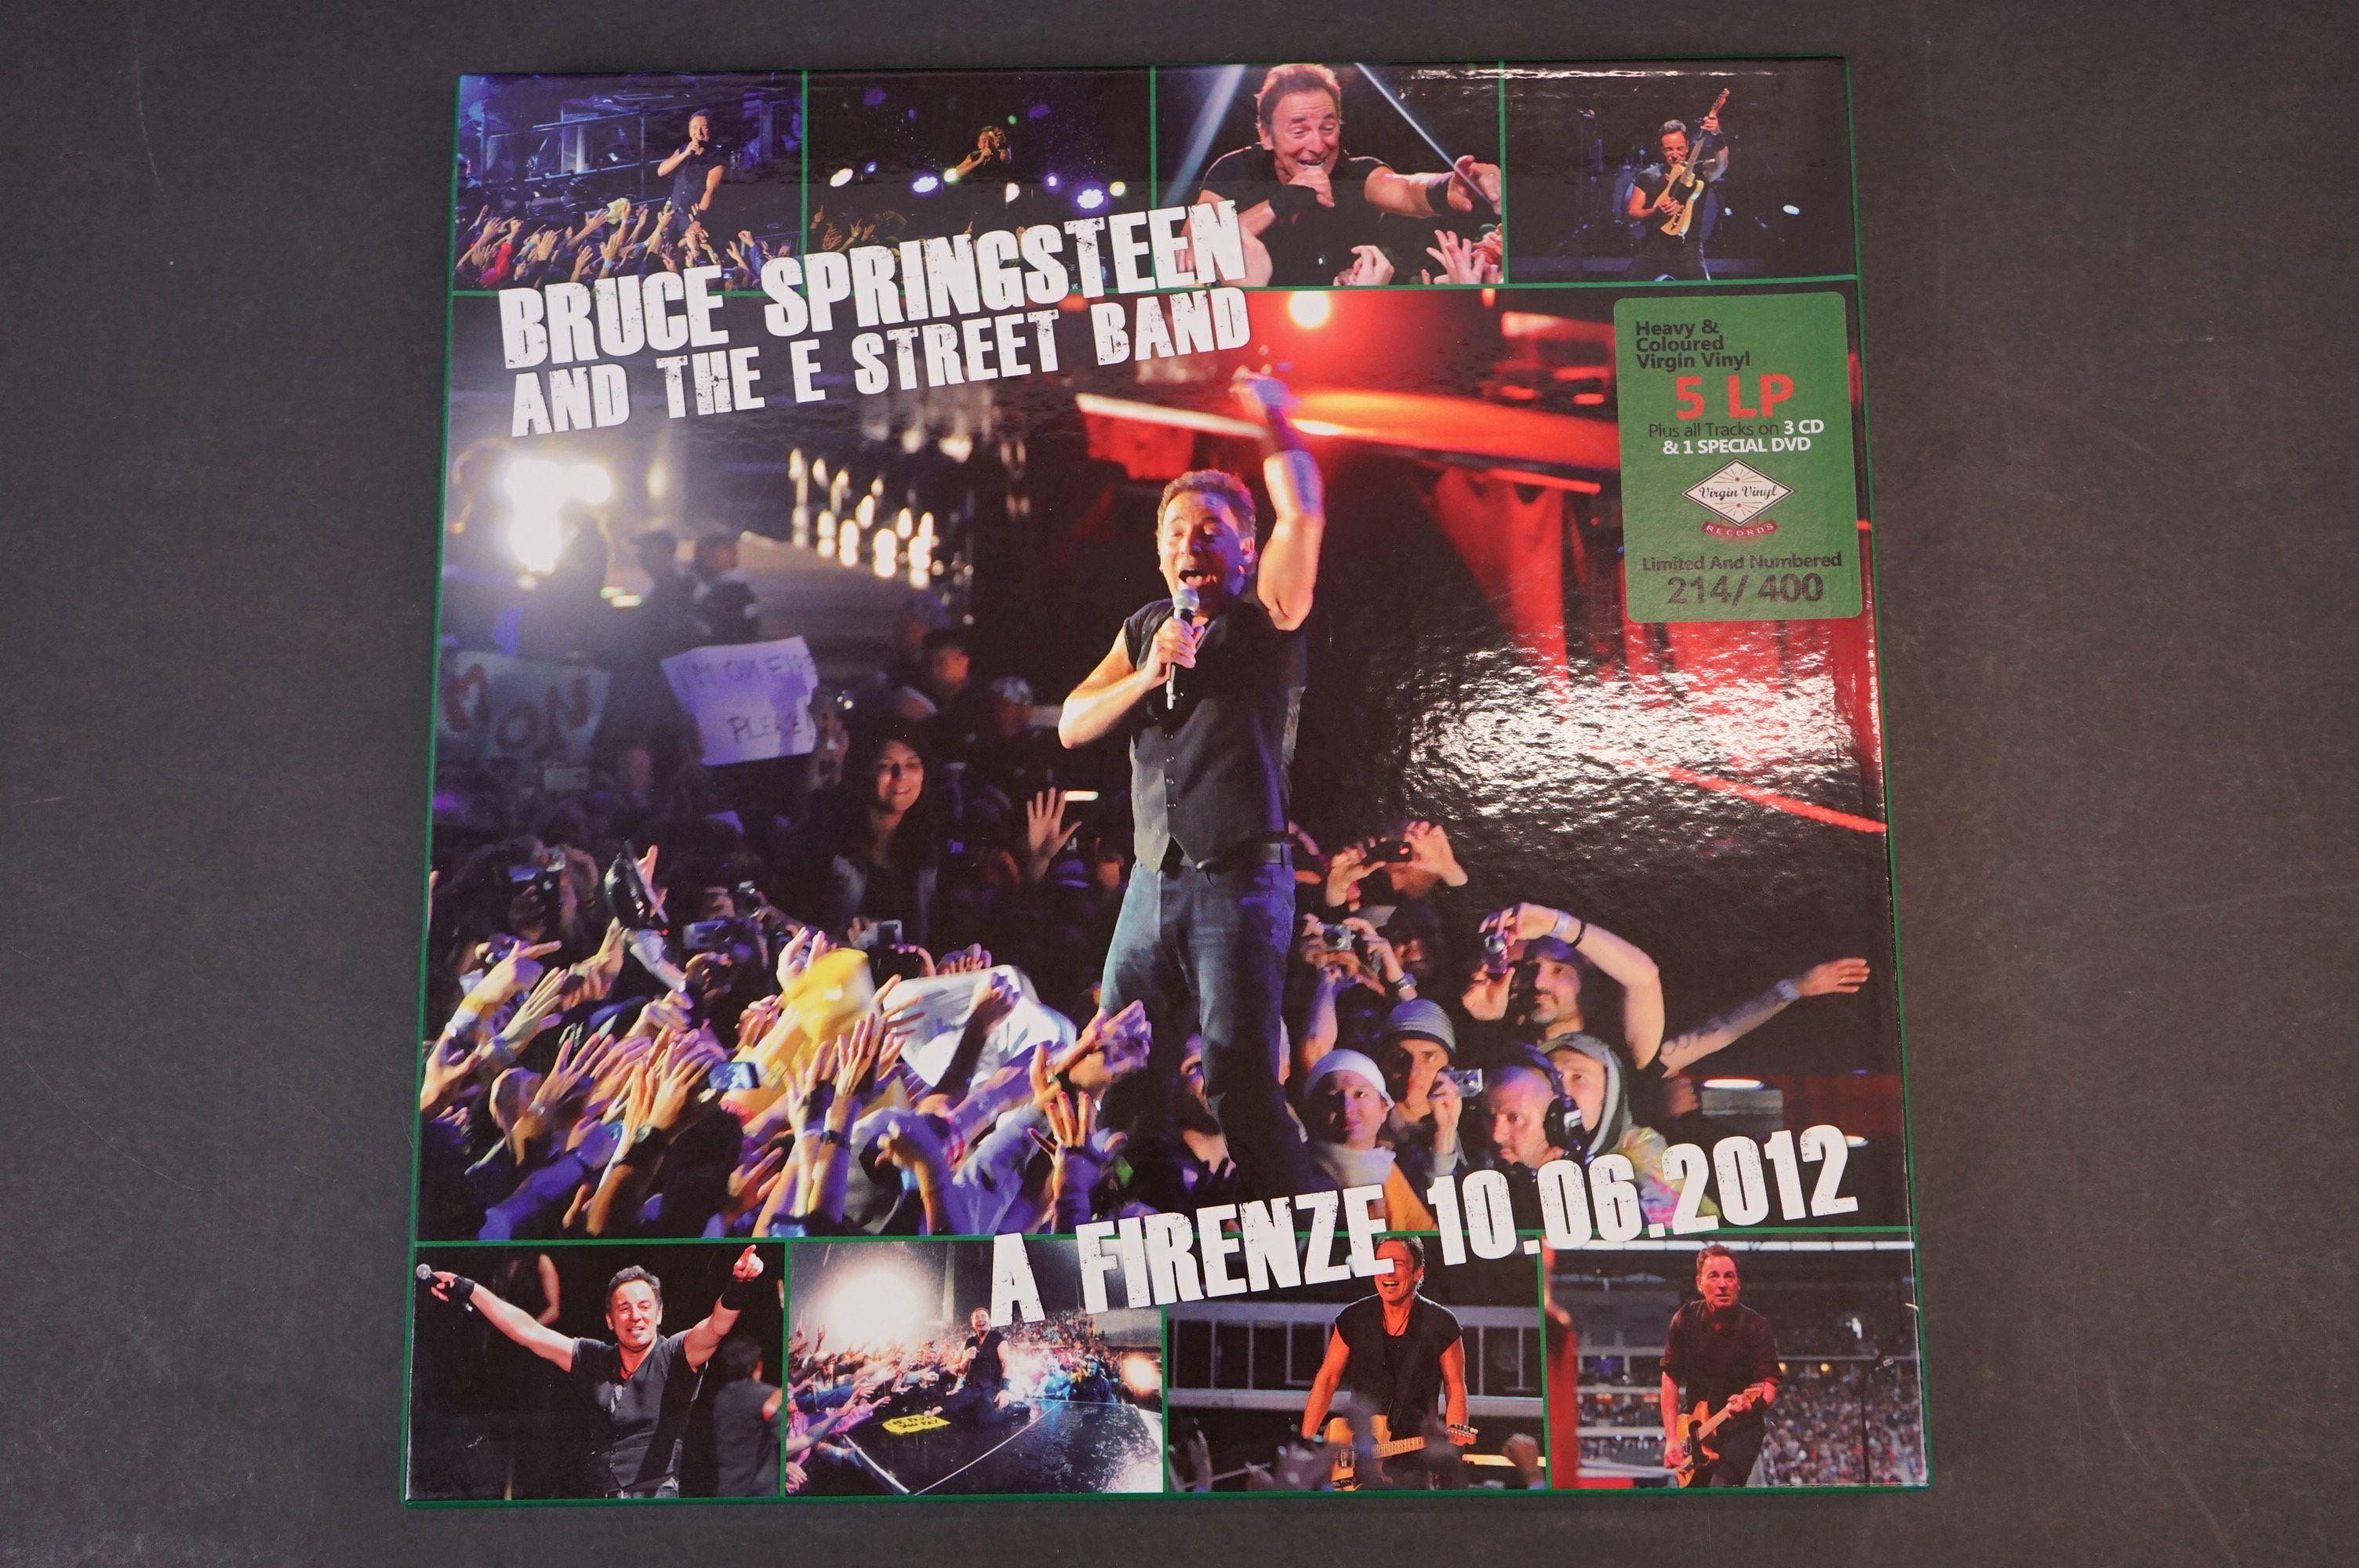 Vinyl - ltd edn Bruce Springsteen and The E Street Band A Firenze 10.06.2012 5 LP 3 CD 1 DVD heavy